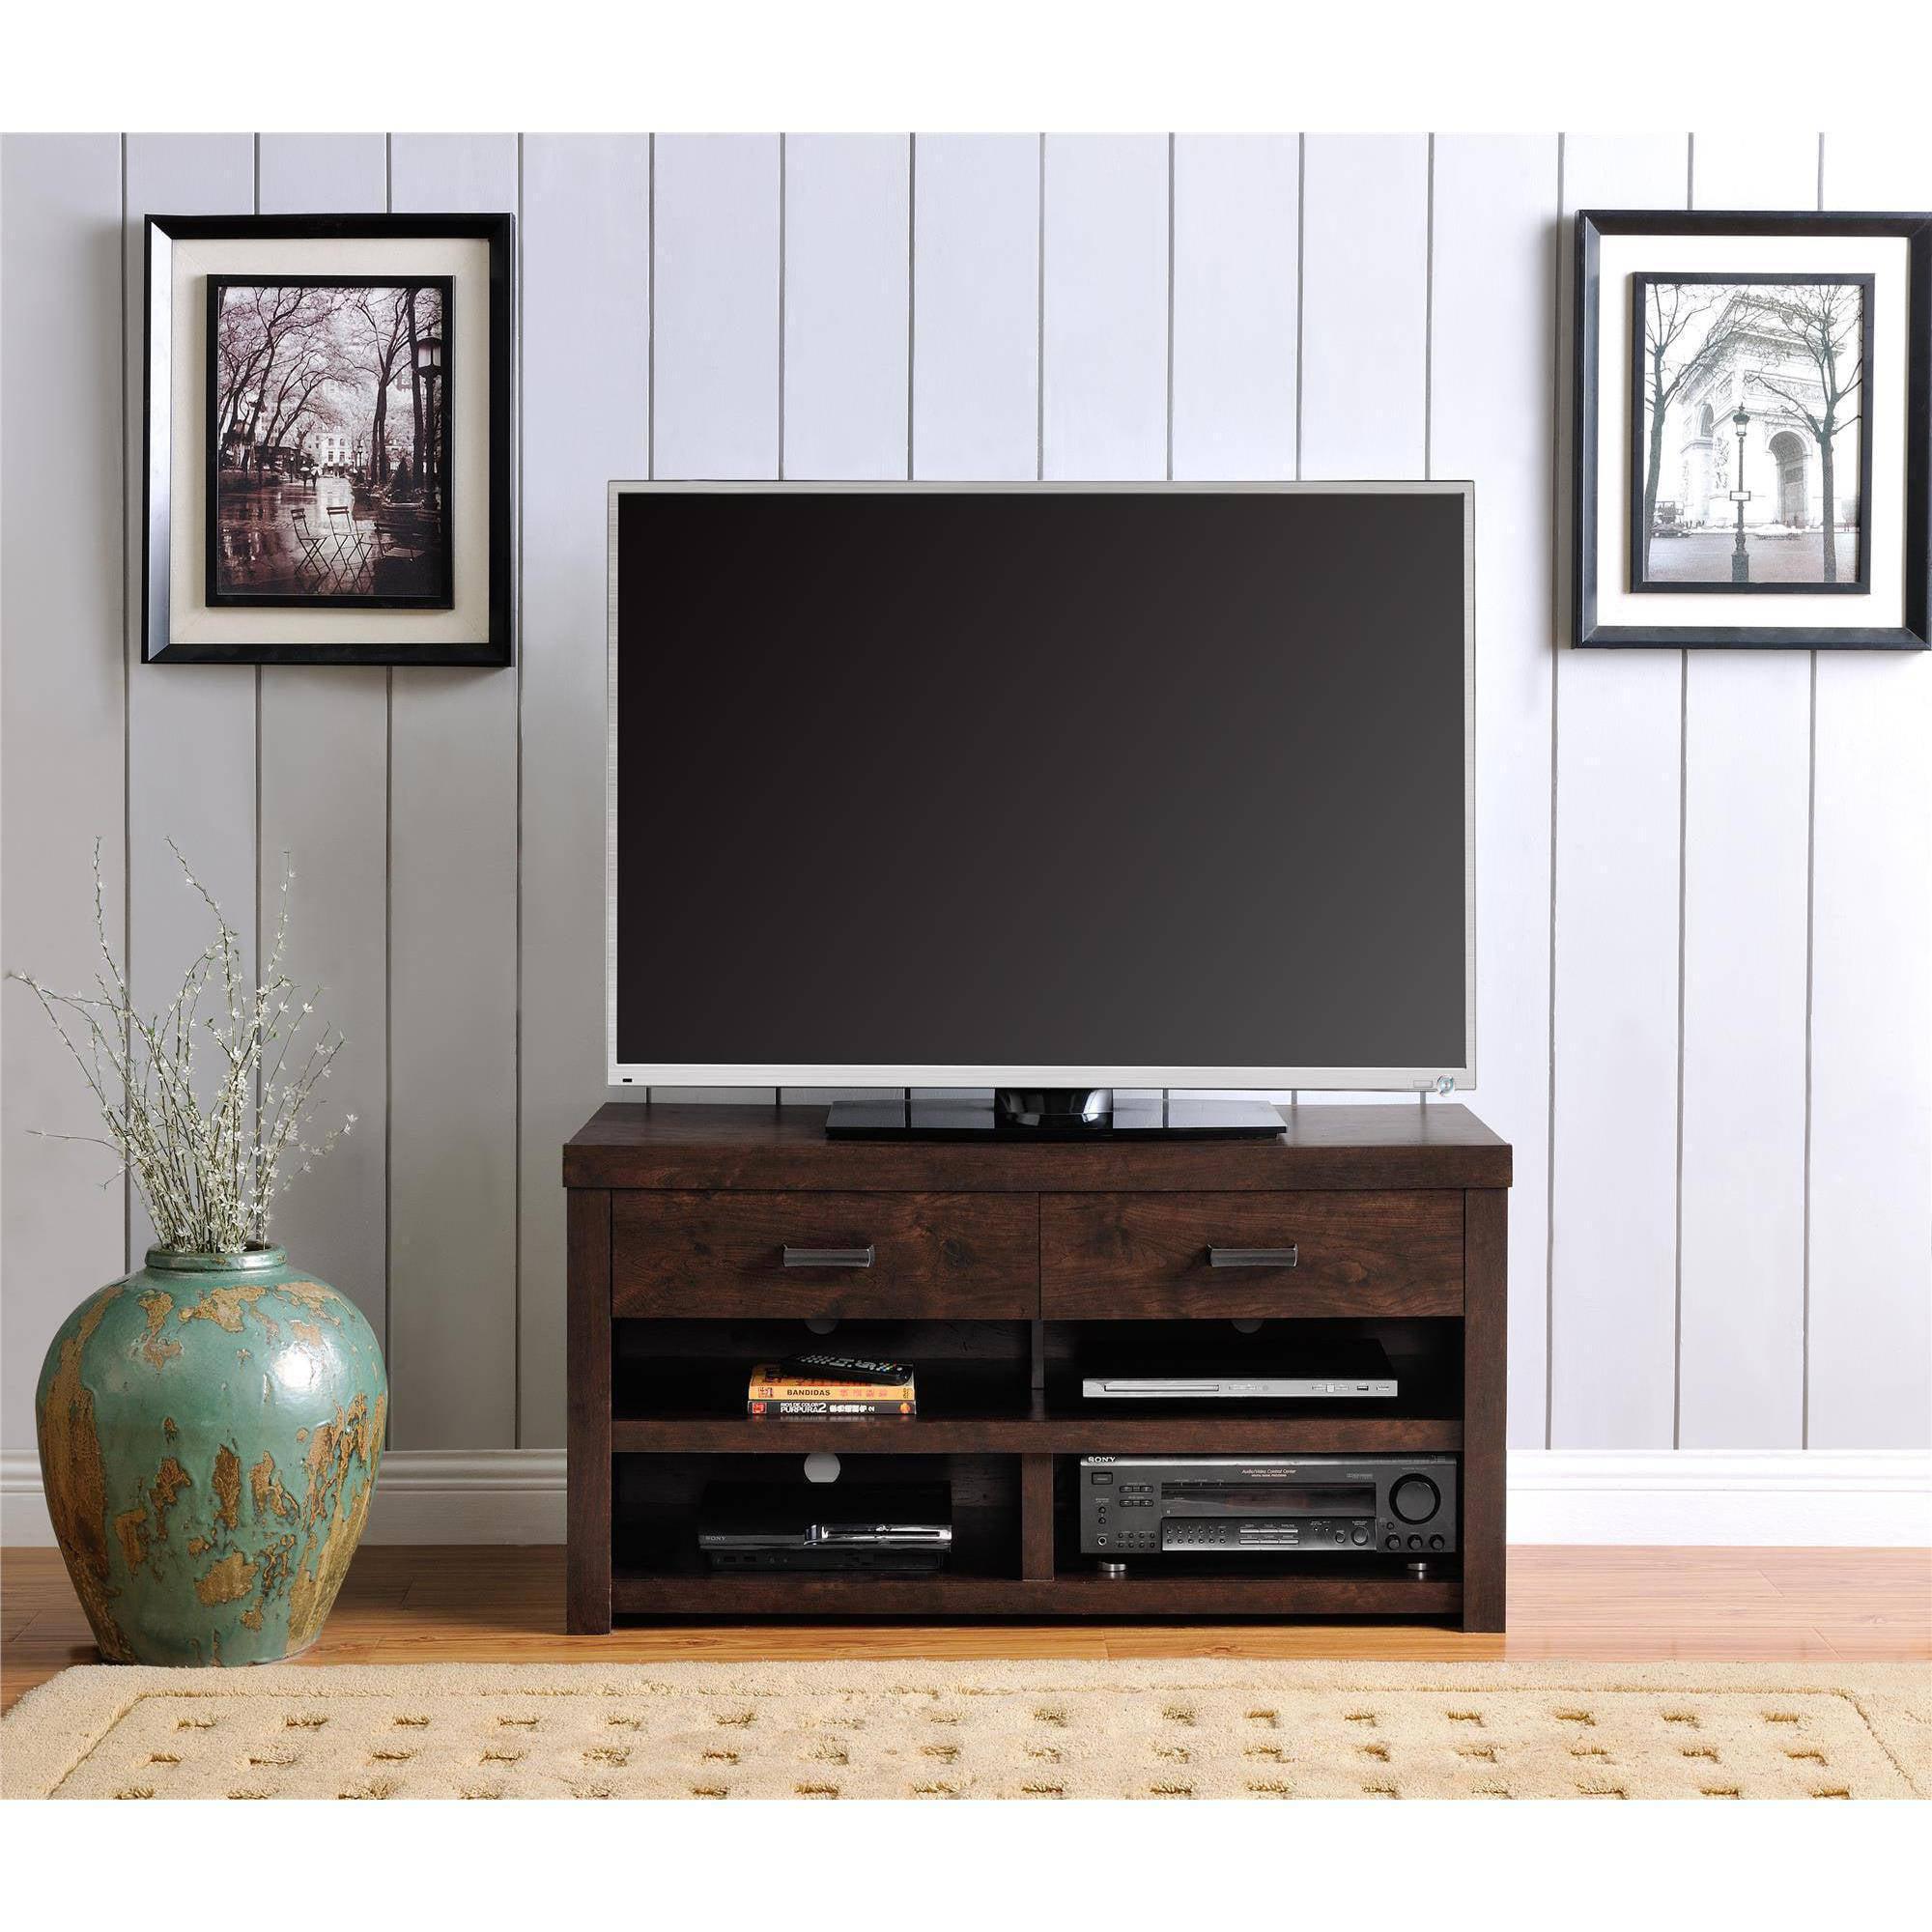 "Westbrook TV Stand for TVs up to 42"", Dark Walnut"